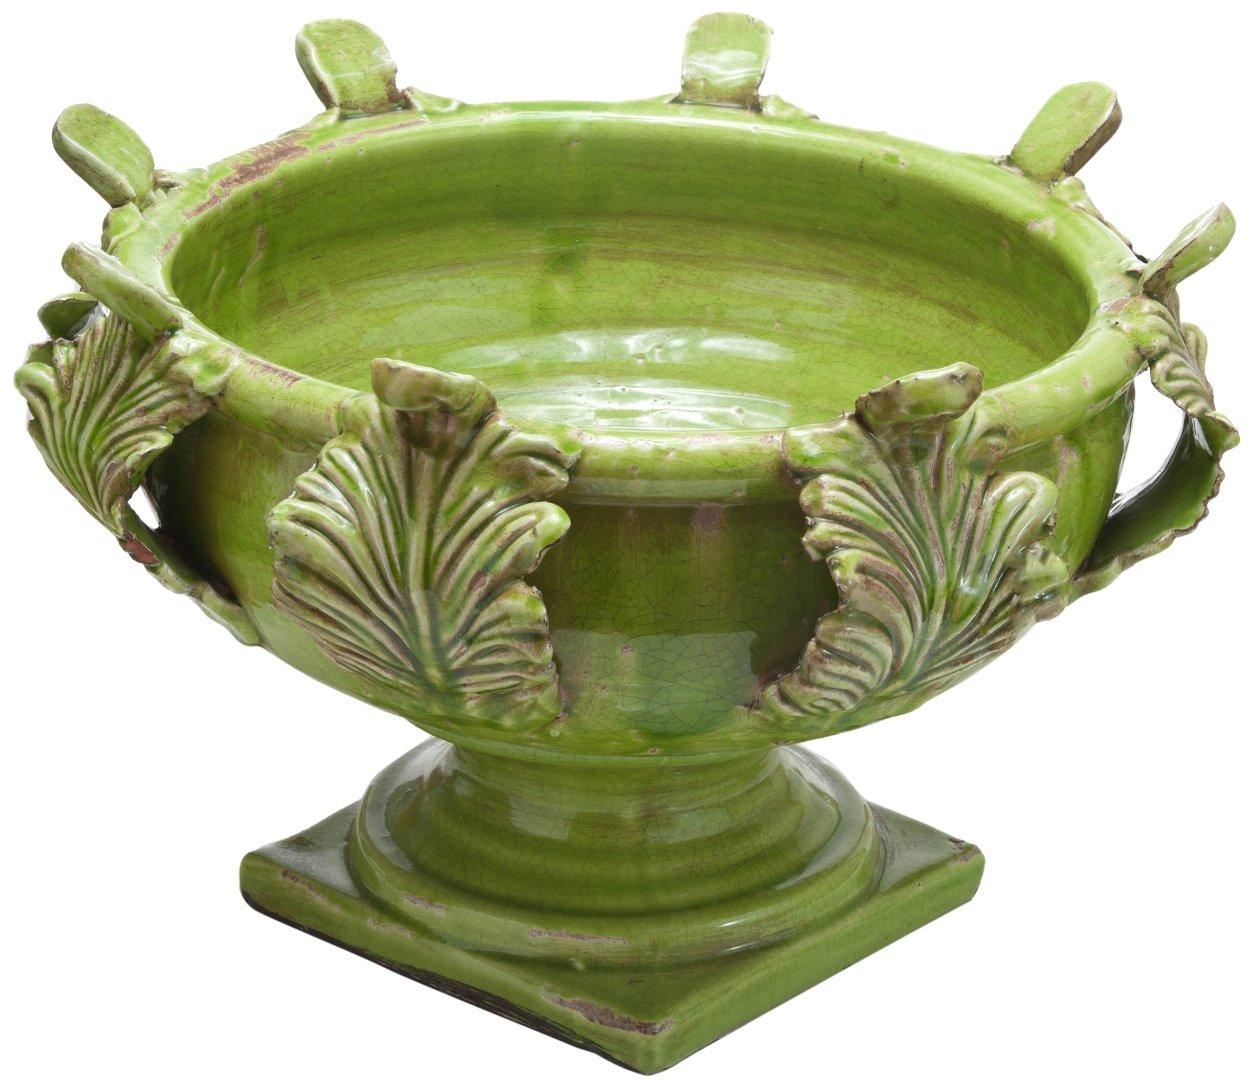 Abigails 13.75 by 13.75 by 10-Inch Acanthus Vinci Centerpiece, Medium, Green by Abigails